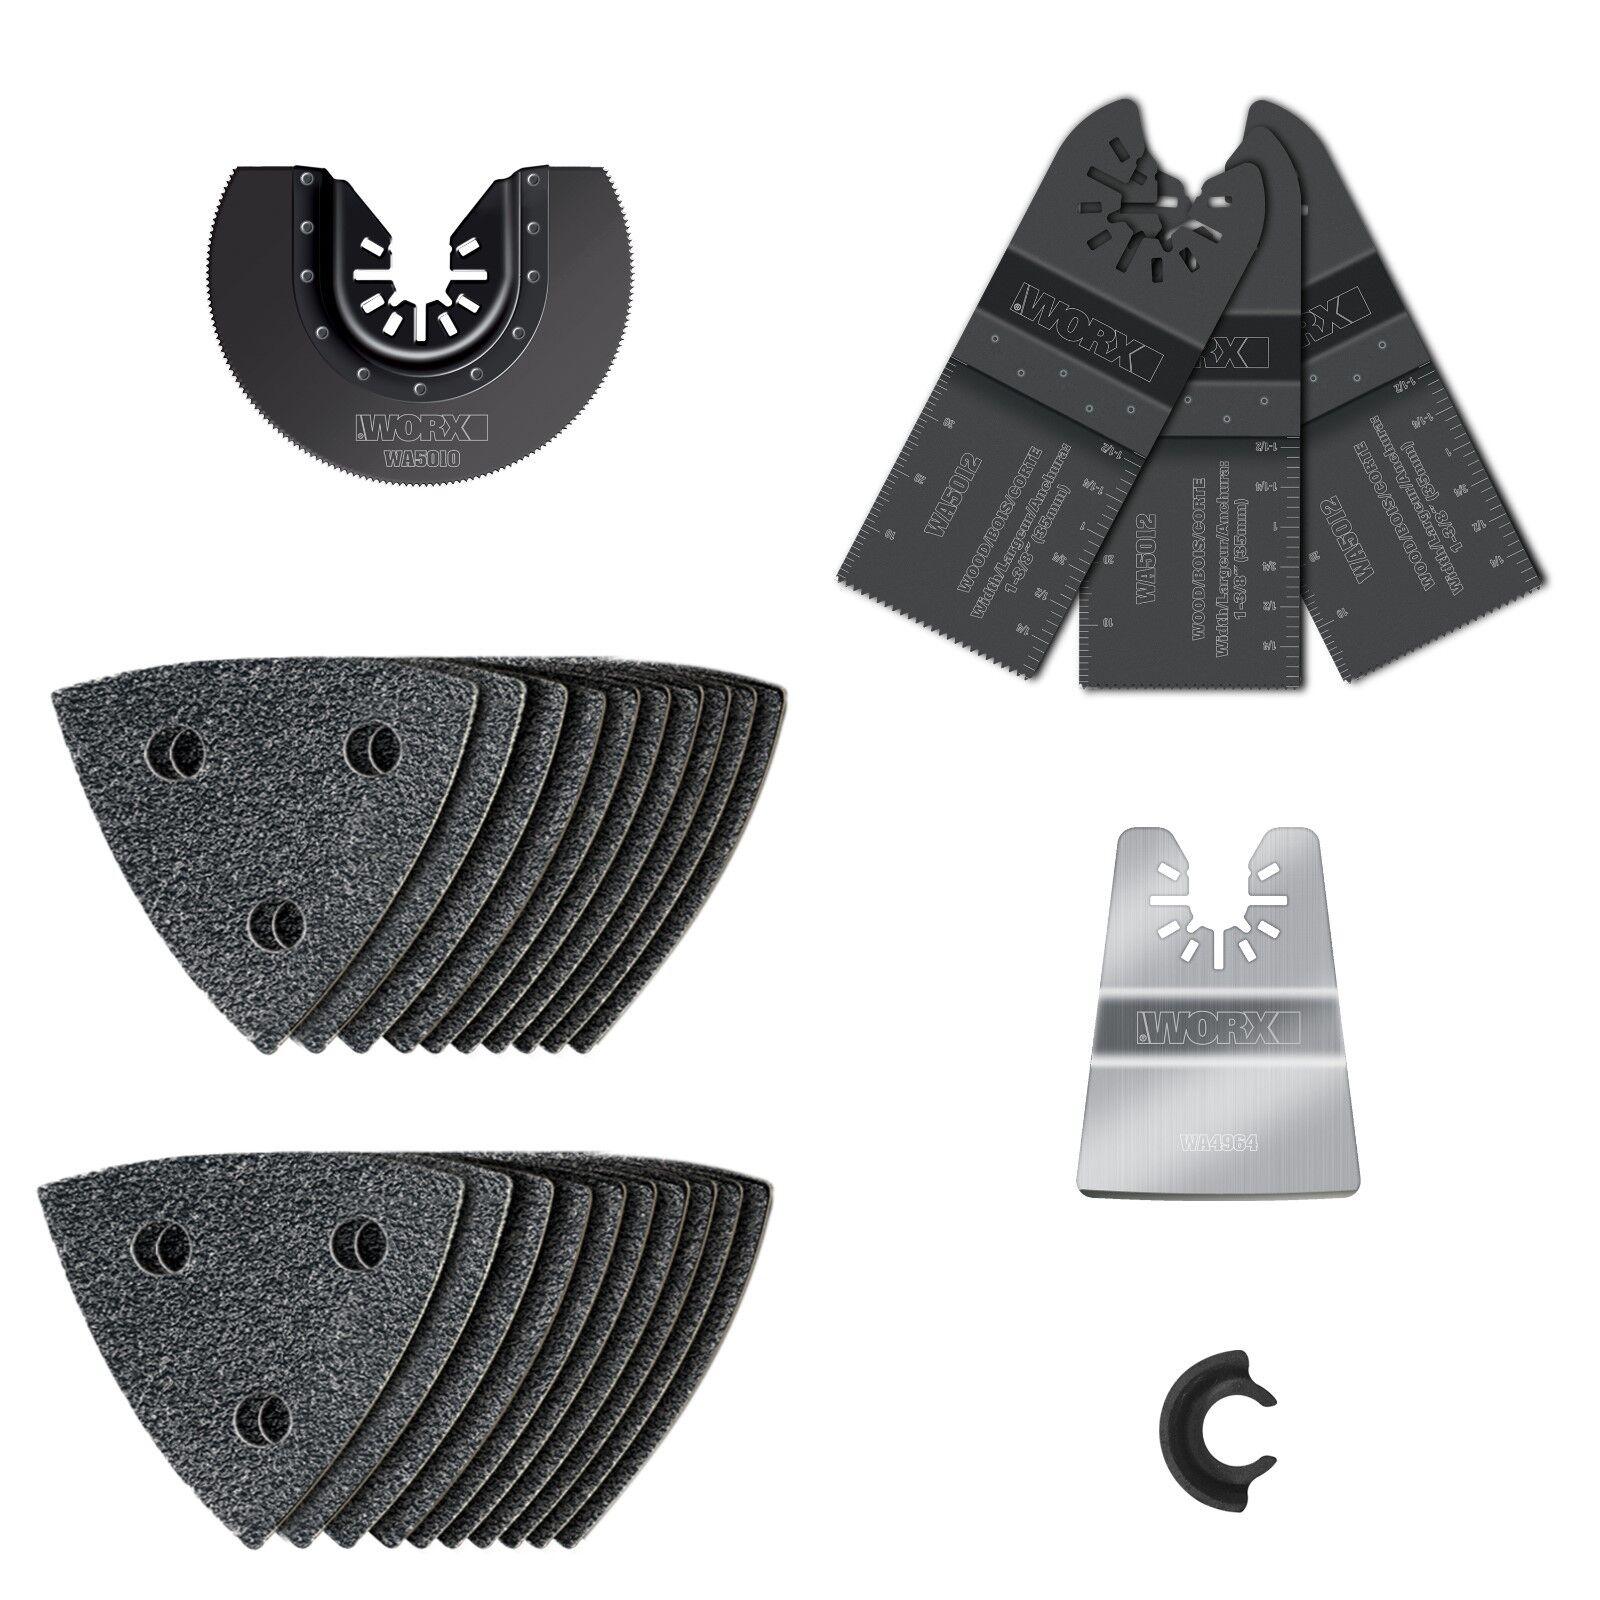 worx-wa5701-26-pc-universal-fit-oscillating-tool-accessory-kit